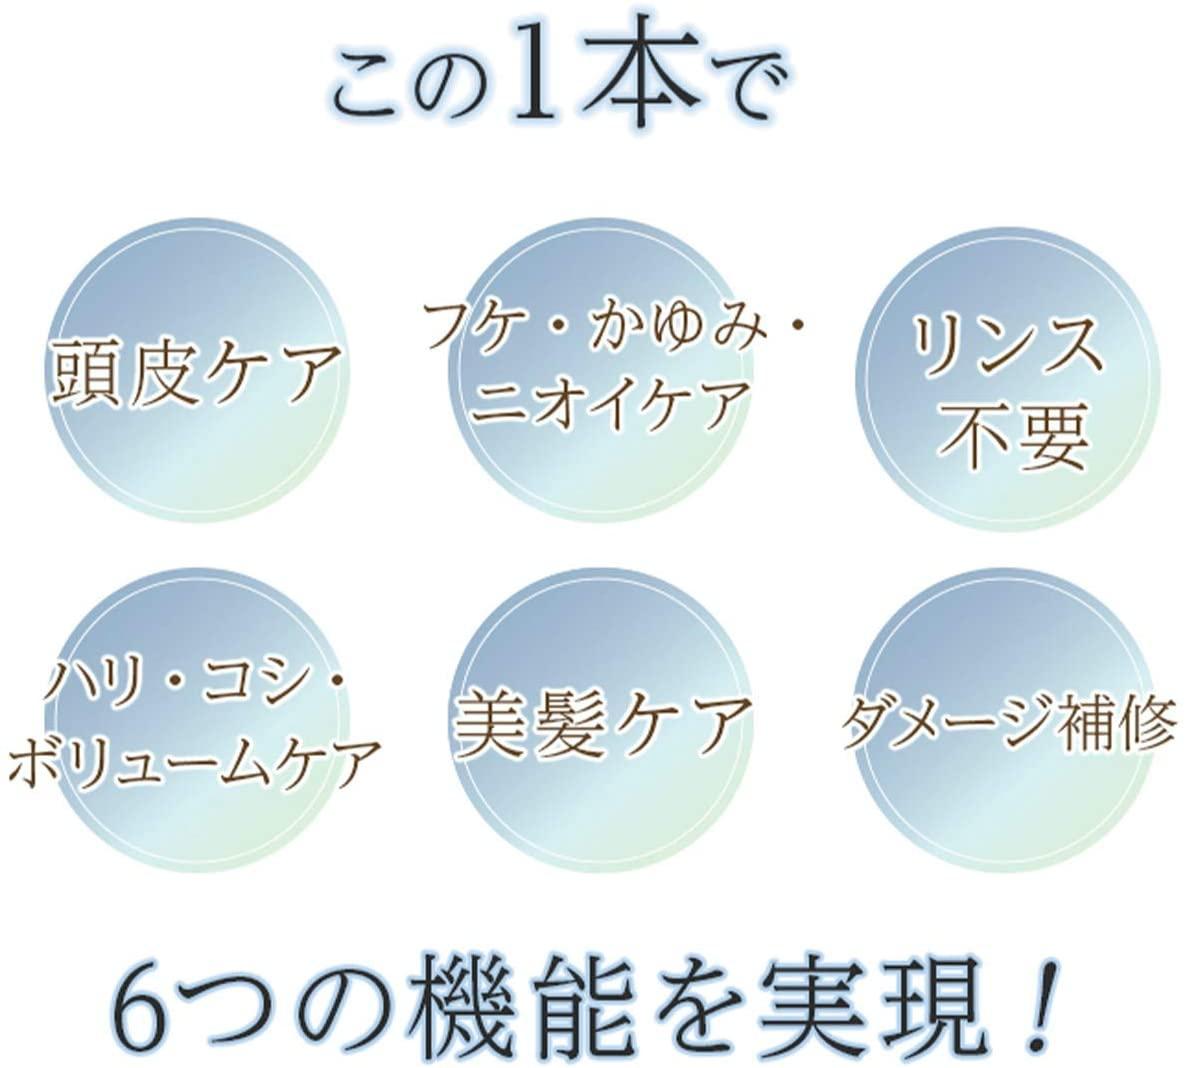 haru(ハル)kurokami スカルプの商品画像13